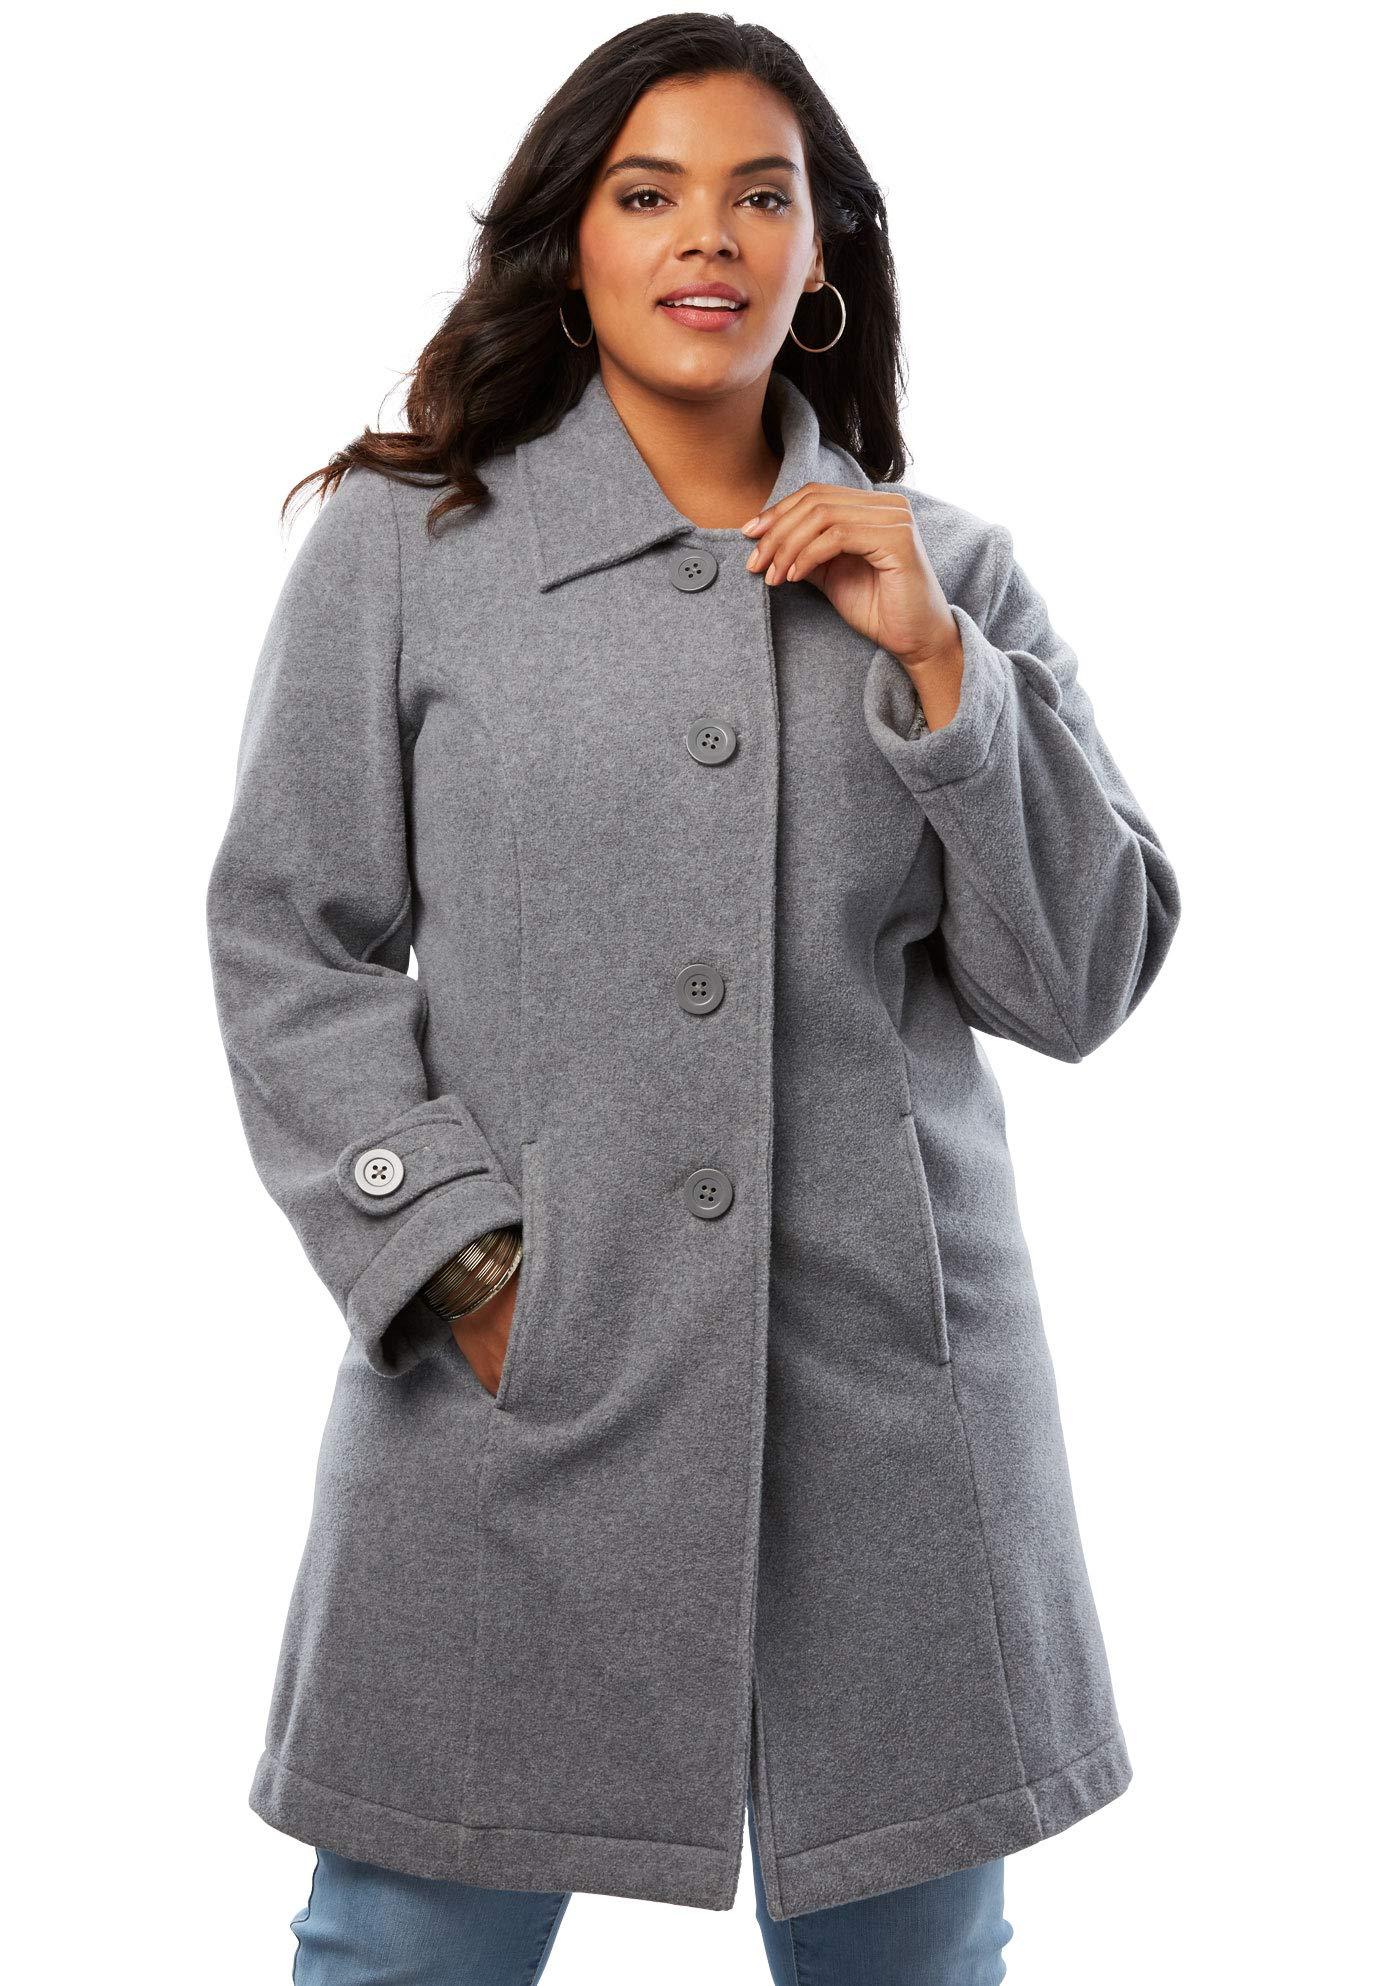 Roamans Women's Plus Size Plush Fleece Jacket - Heather Grey, 5X by Roamans